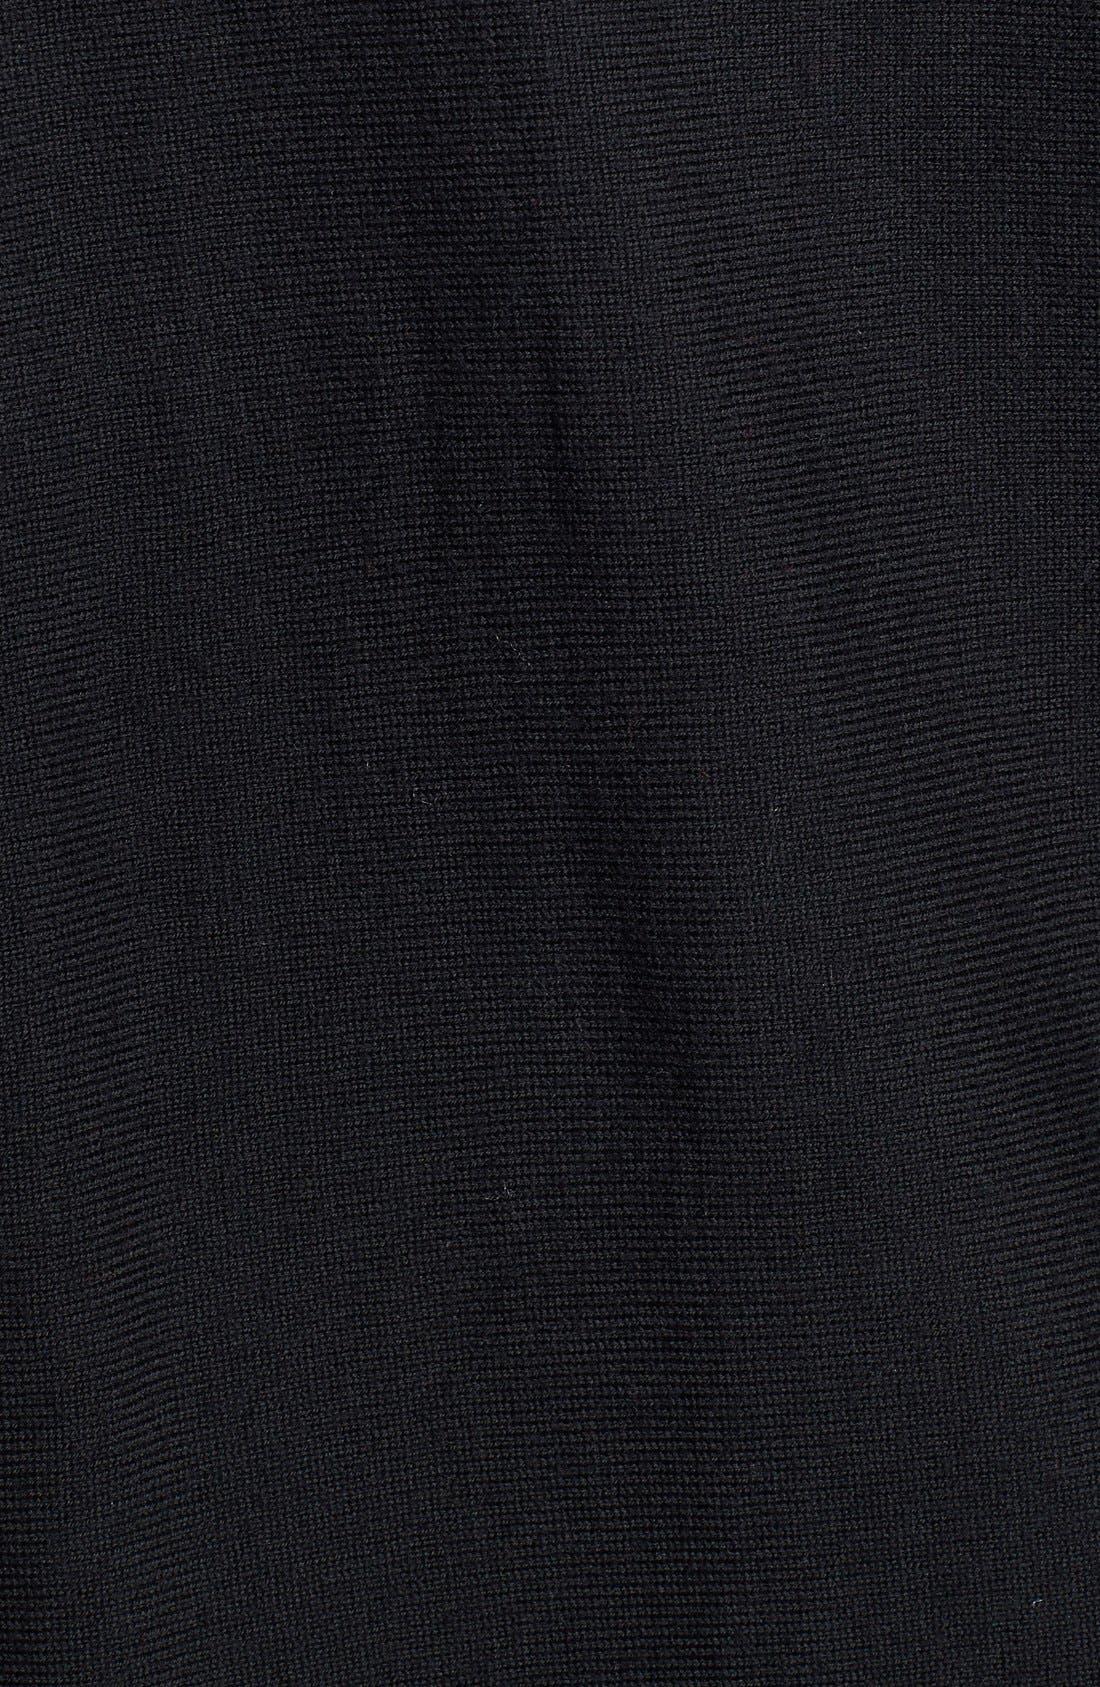 Alternate Image 3  - Eileen Fisher Merino Jersey V-Neck Cardigan (Regular & Petite)